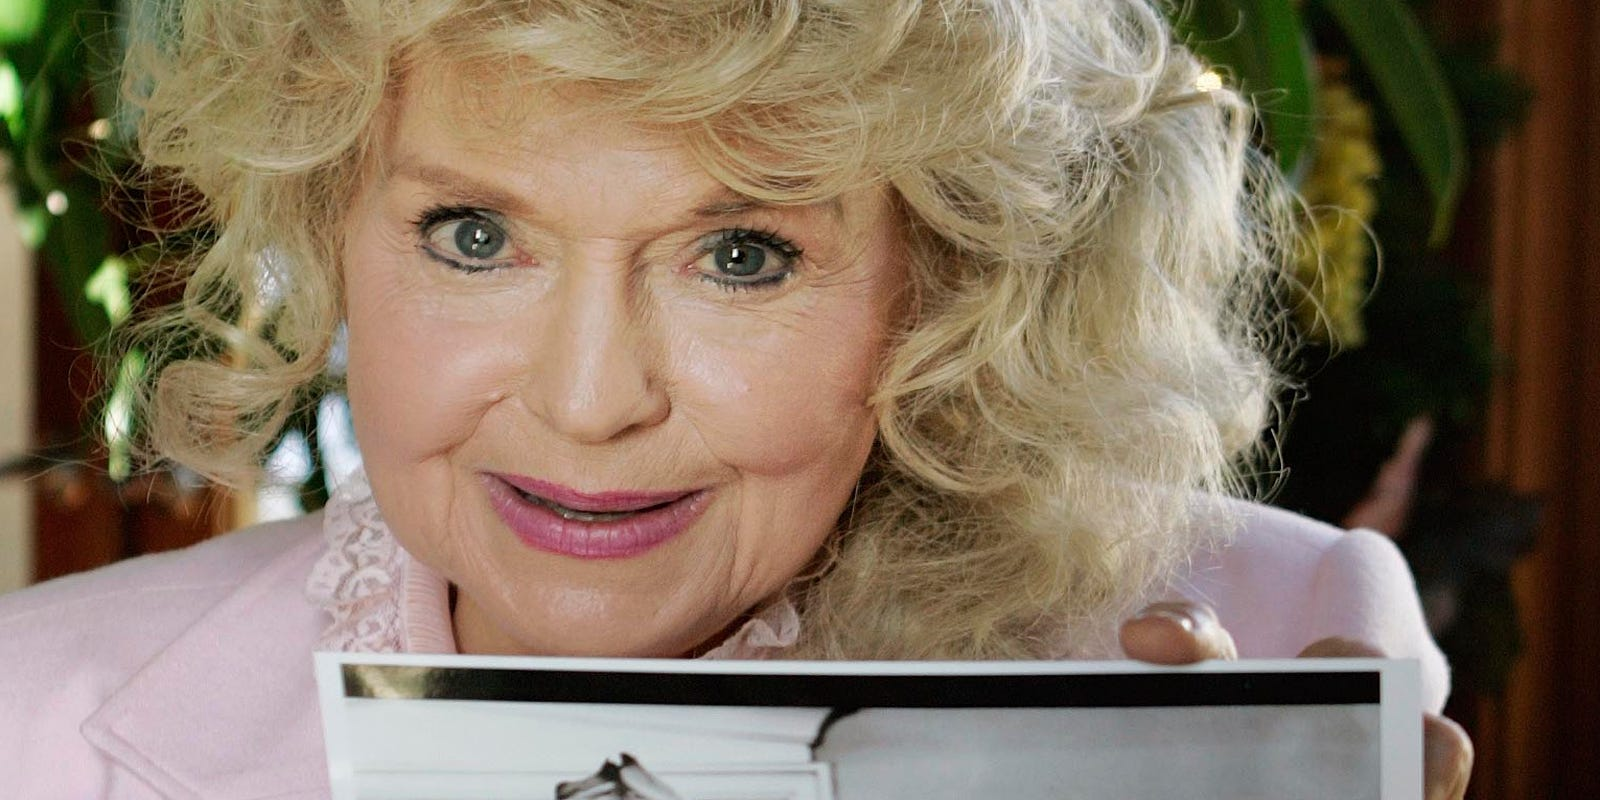 Beverly Hillbillies' star Donna Douglas dies at 82